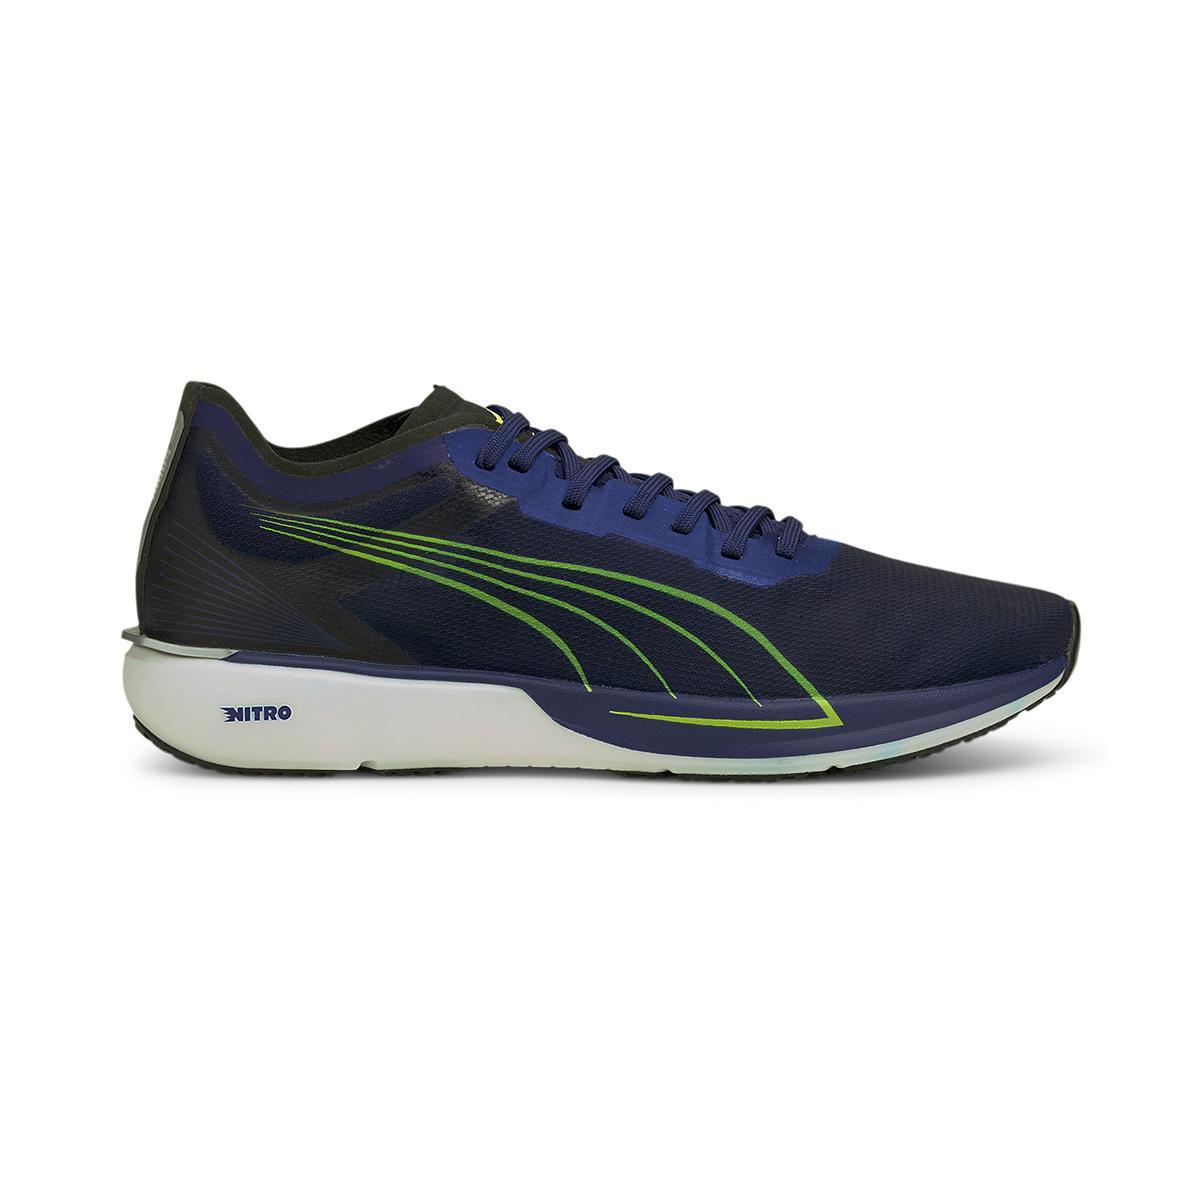 Men's Puma Liberate Nitro Running Shoe - Color: Elektro Blue - Size: 7 - Width: Regular, Elektro Blue, large, image 1